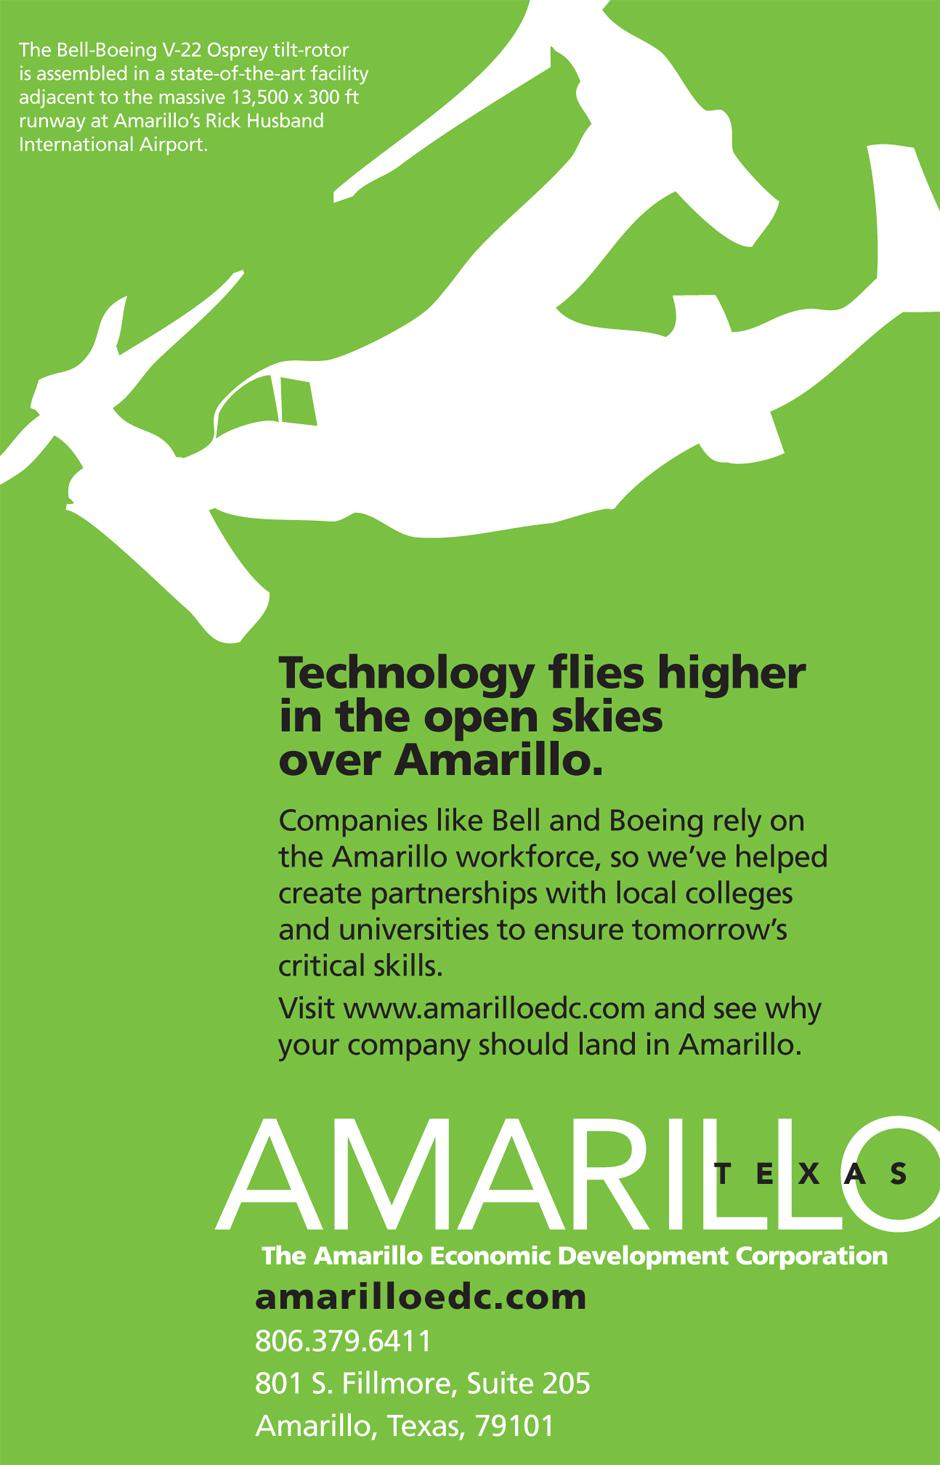 Amarillo Economic Development Corporation